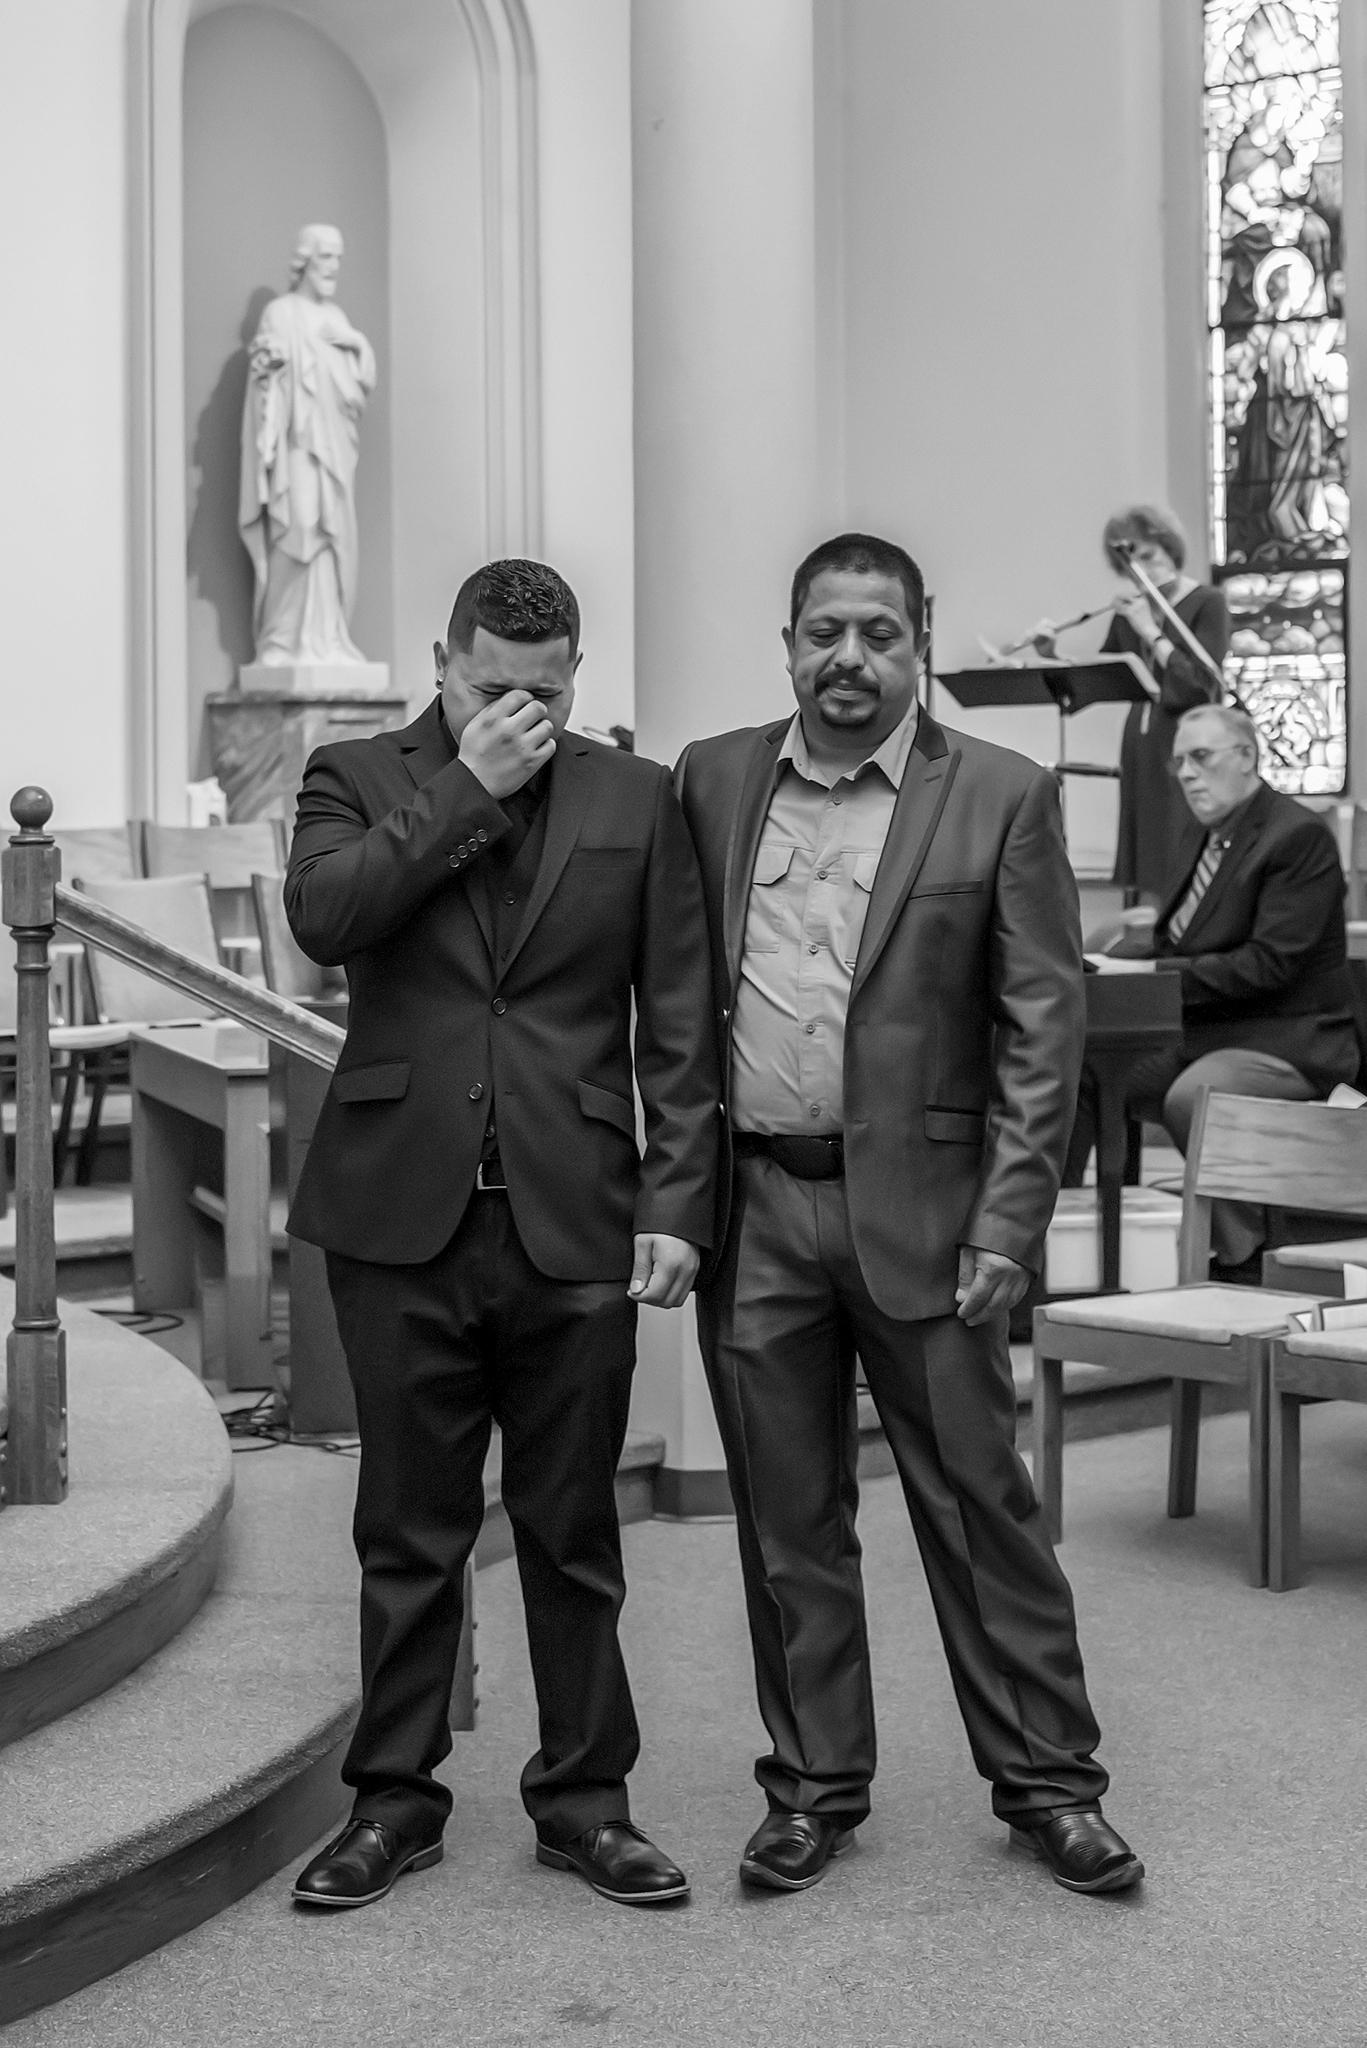 Lindsay-Adkins-Photography-Michigan-Wedding-Photographer-BernalBlog-2